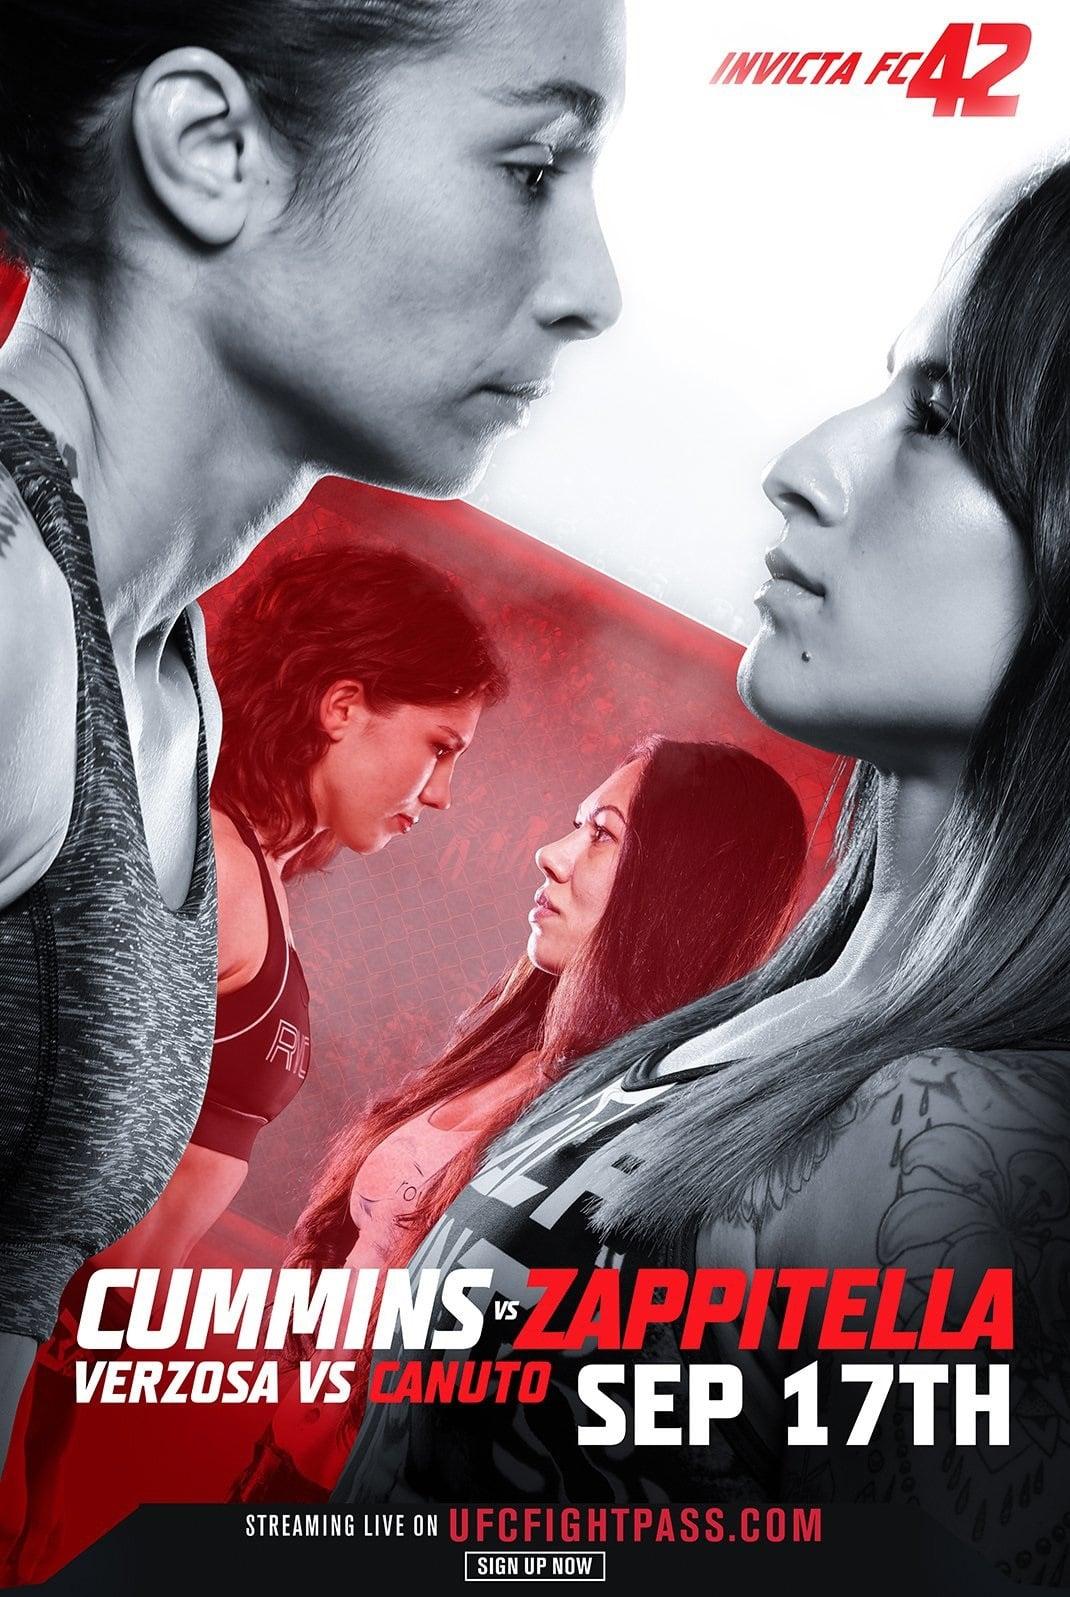 Invicta FC 42: Cummins vs. Zappitella